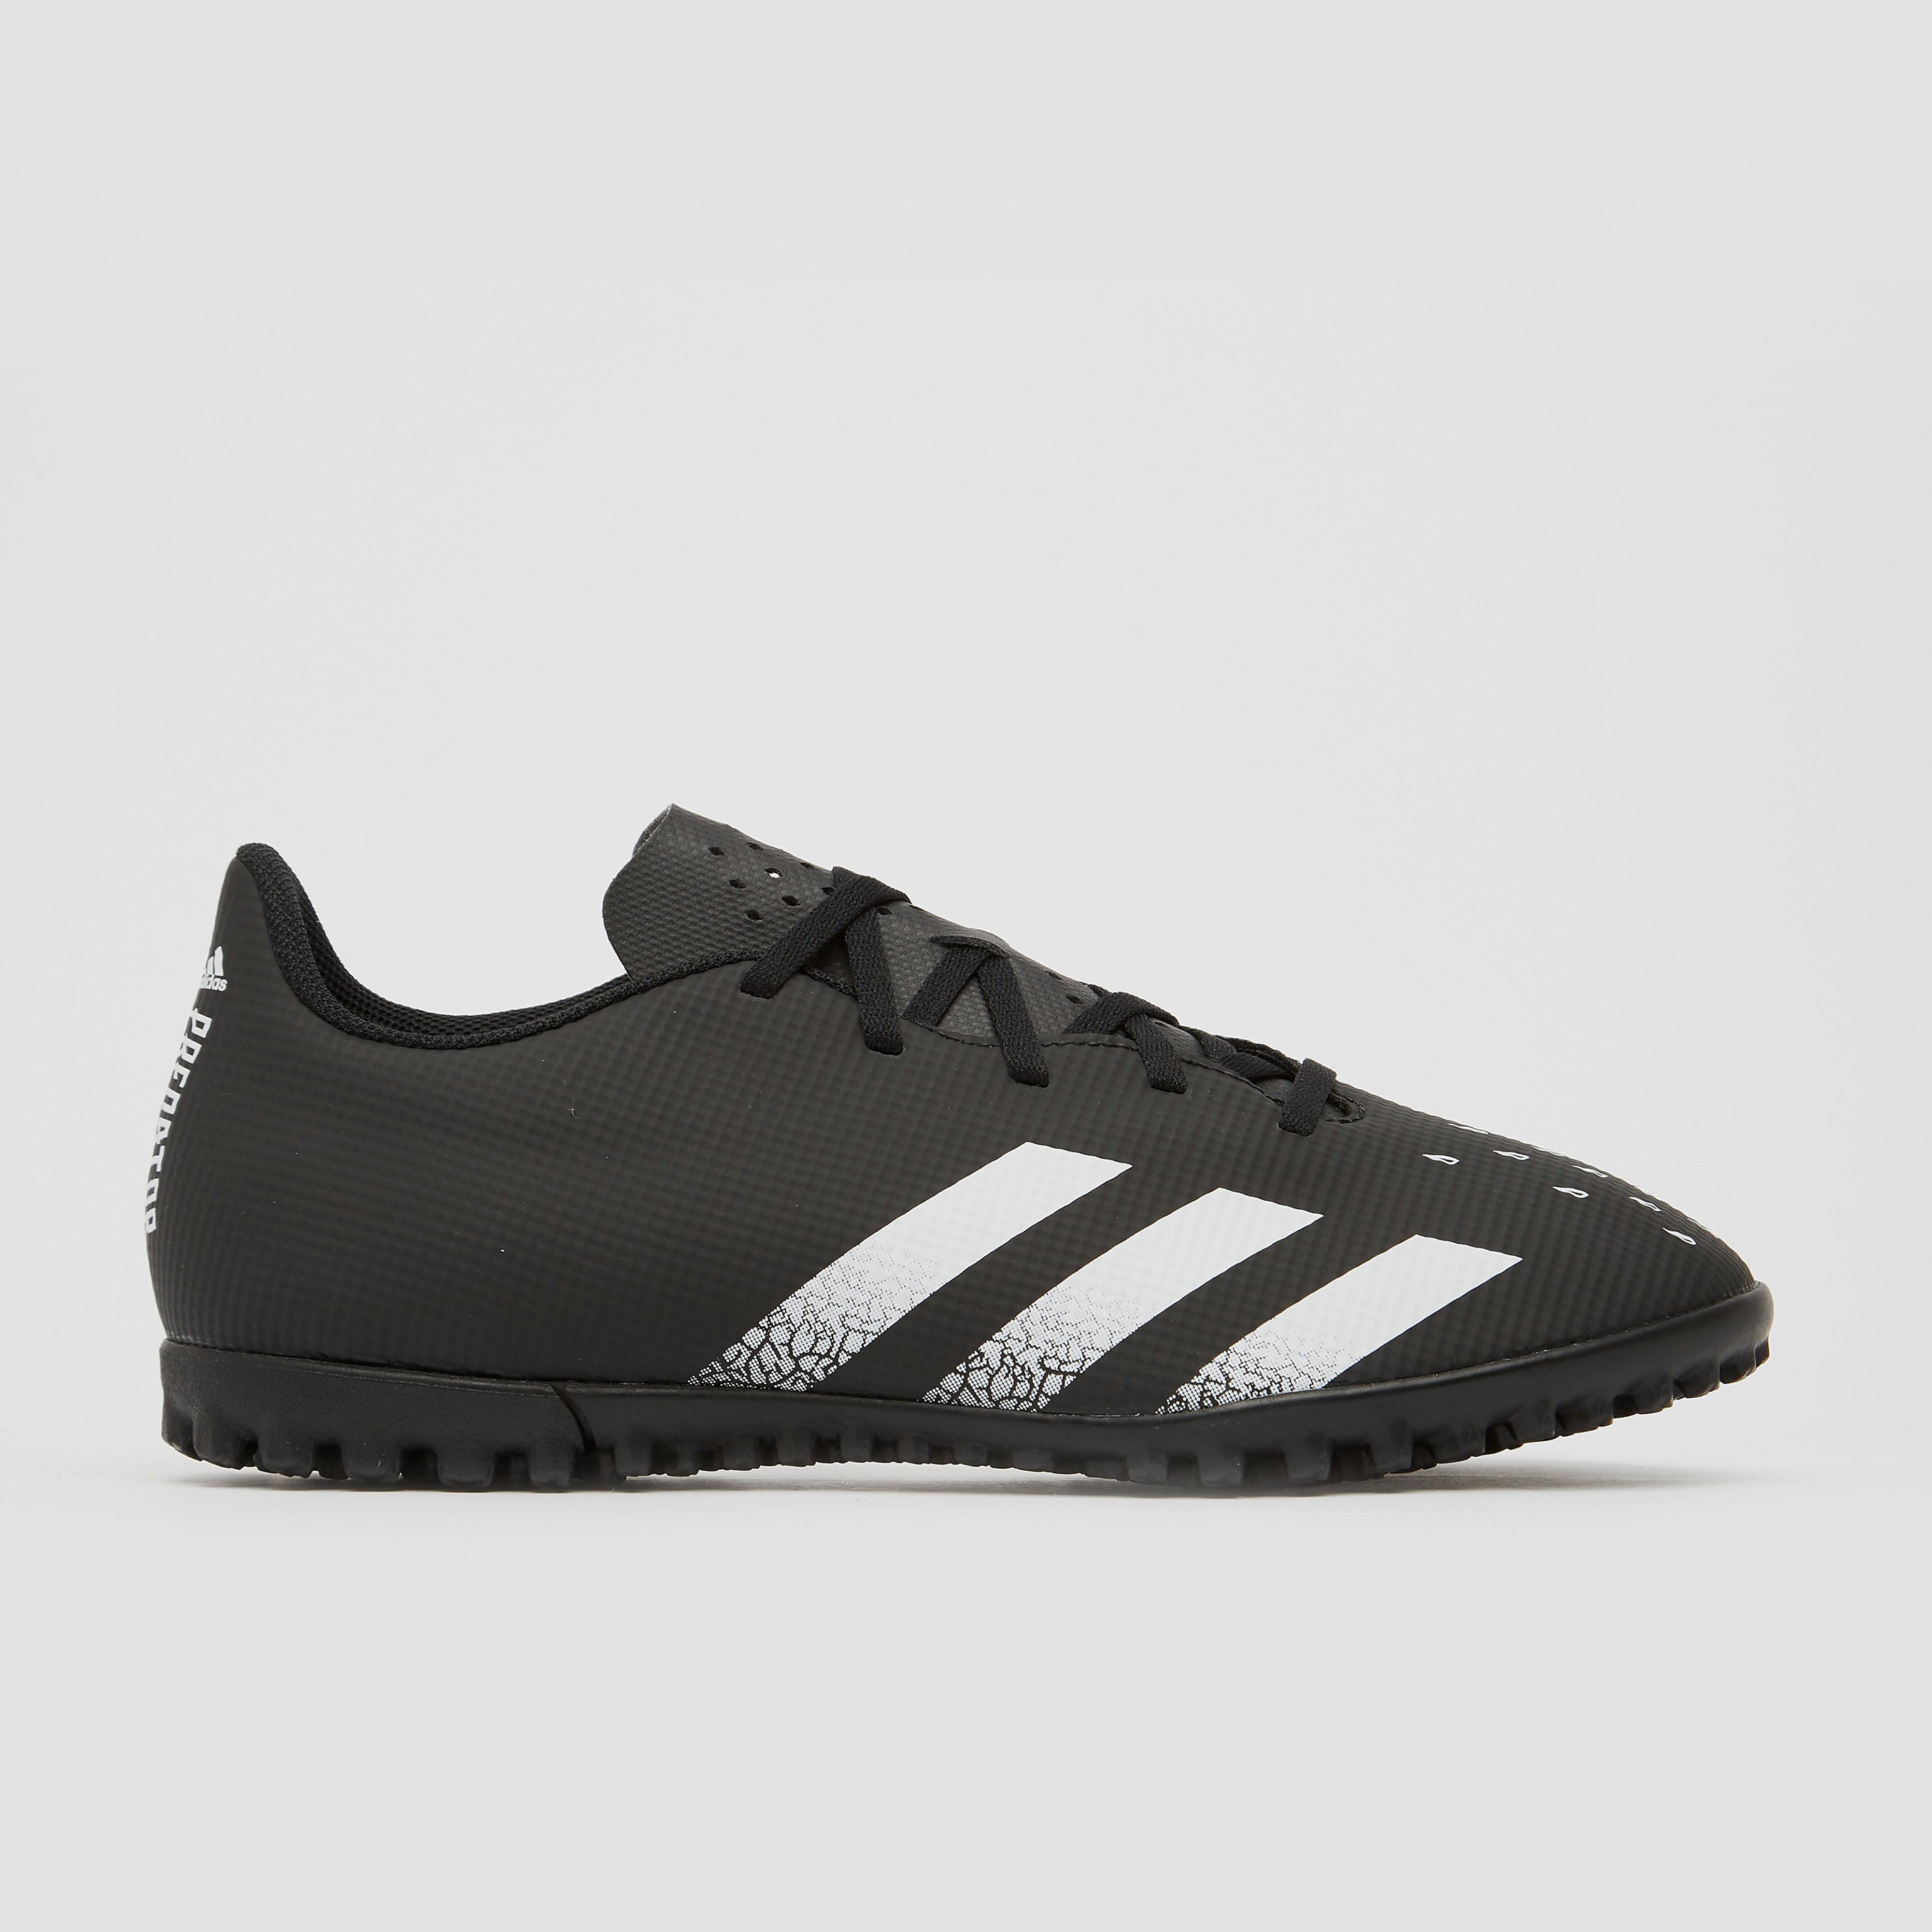 Adidas Predator freak.4 tf voetbalschoenen zwart Dames